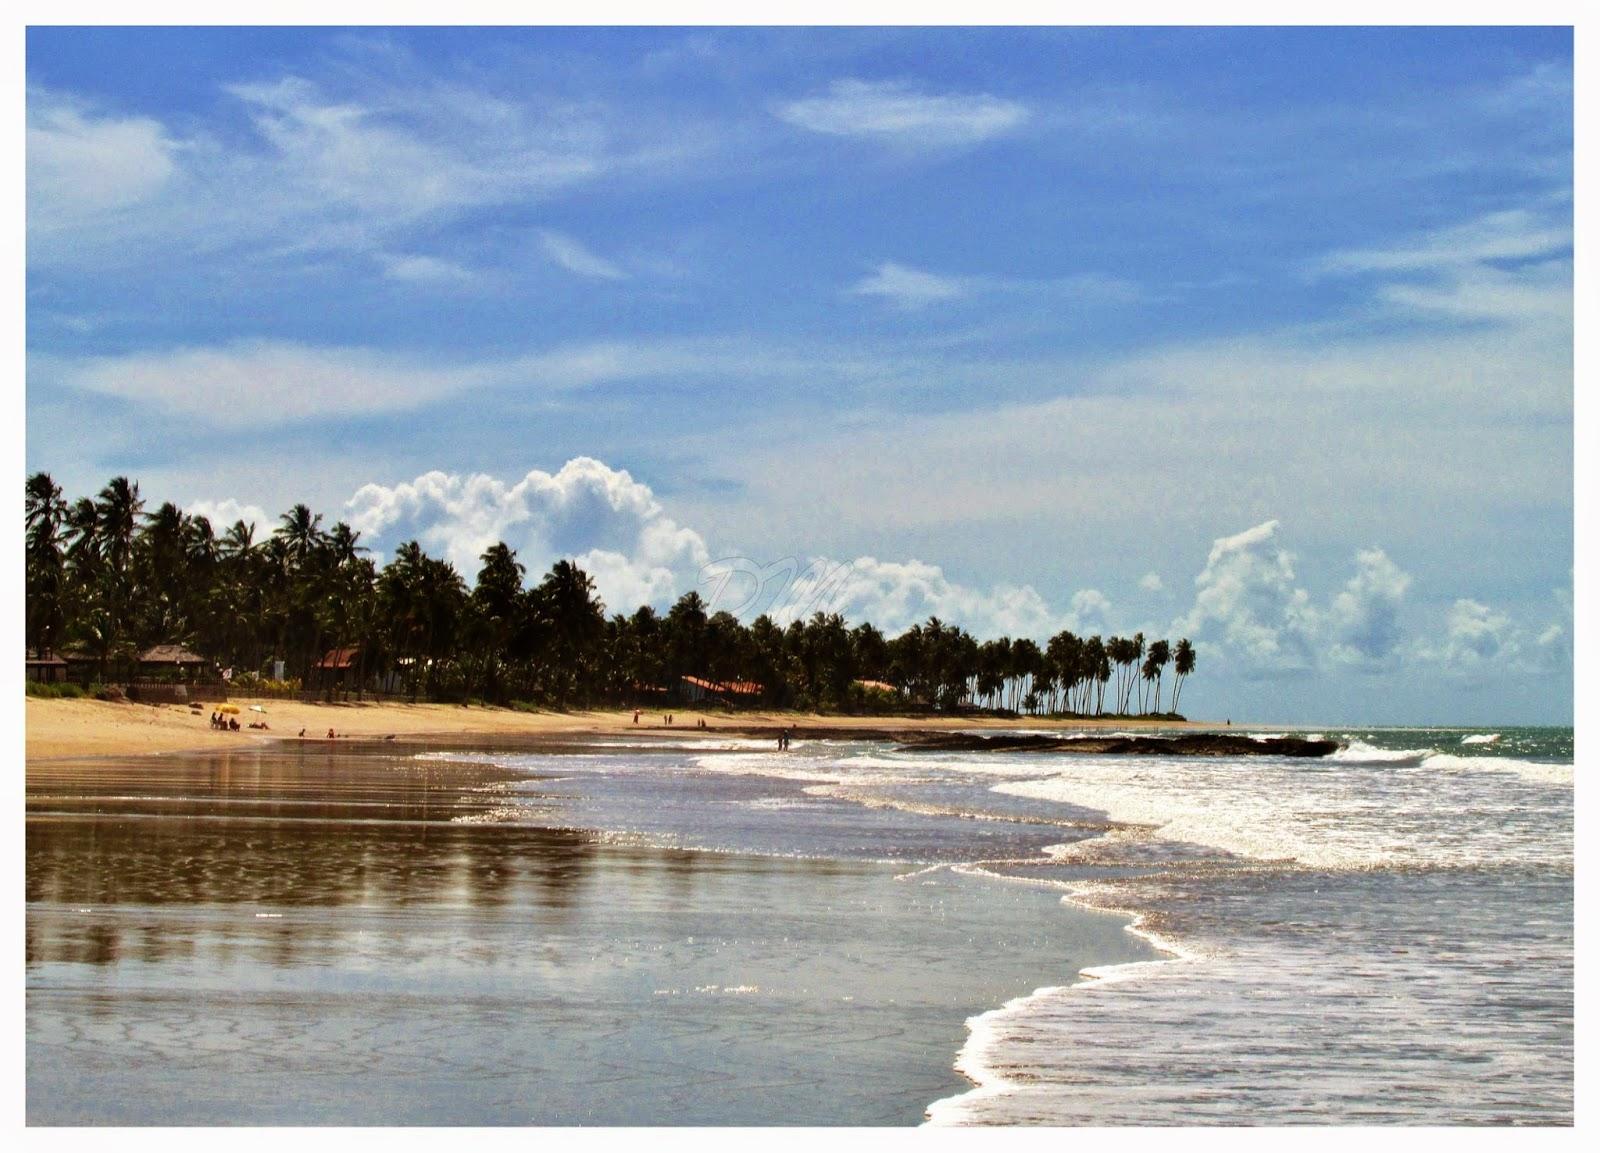 Litoral Sul de Pernambuco